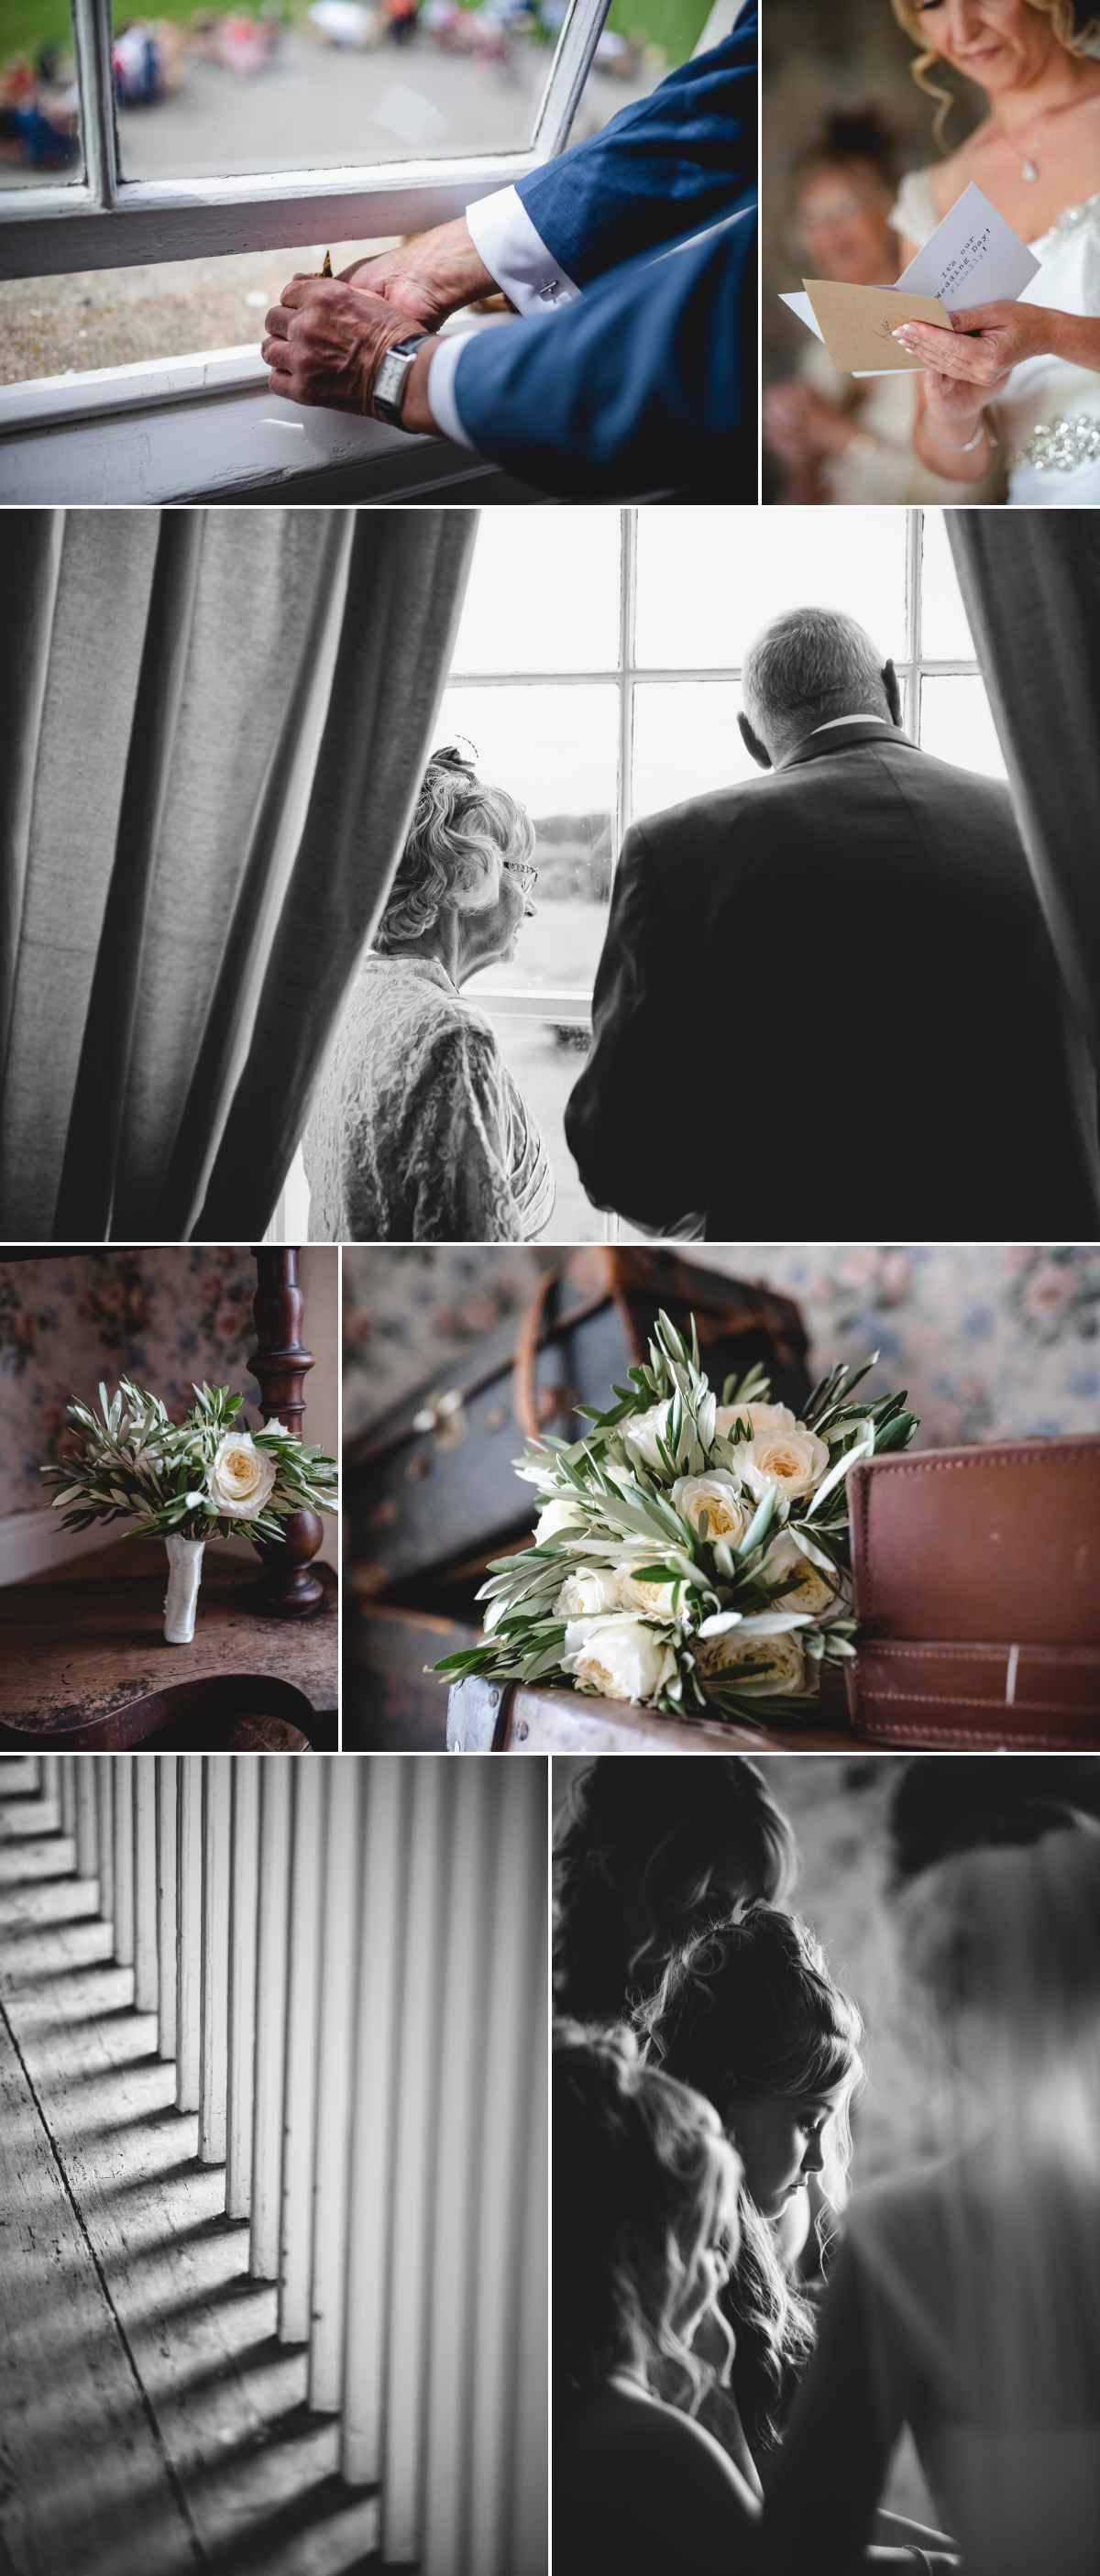 Rustic Wedding Ireland Photographer 05.jpg